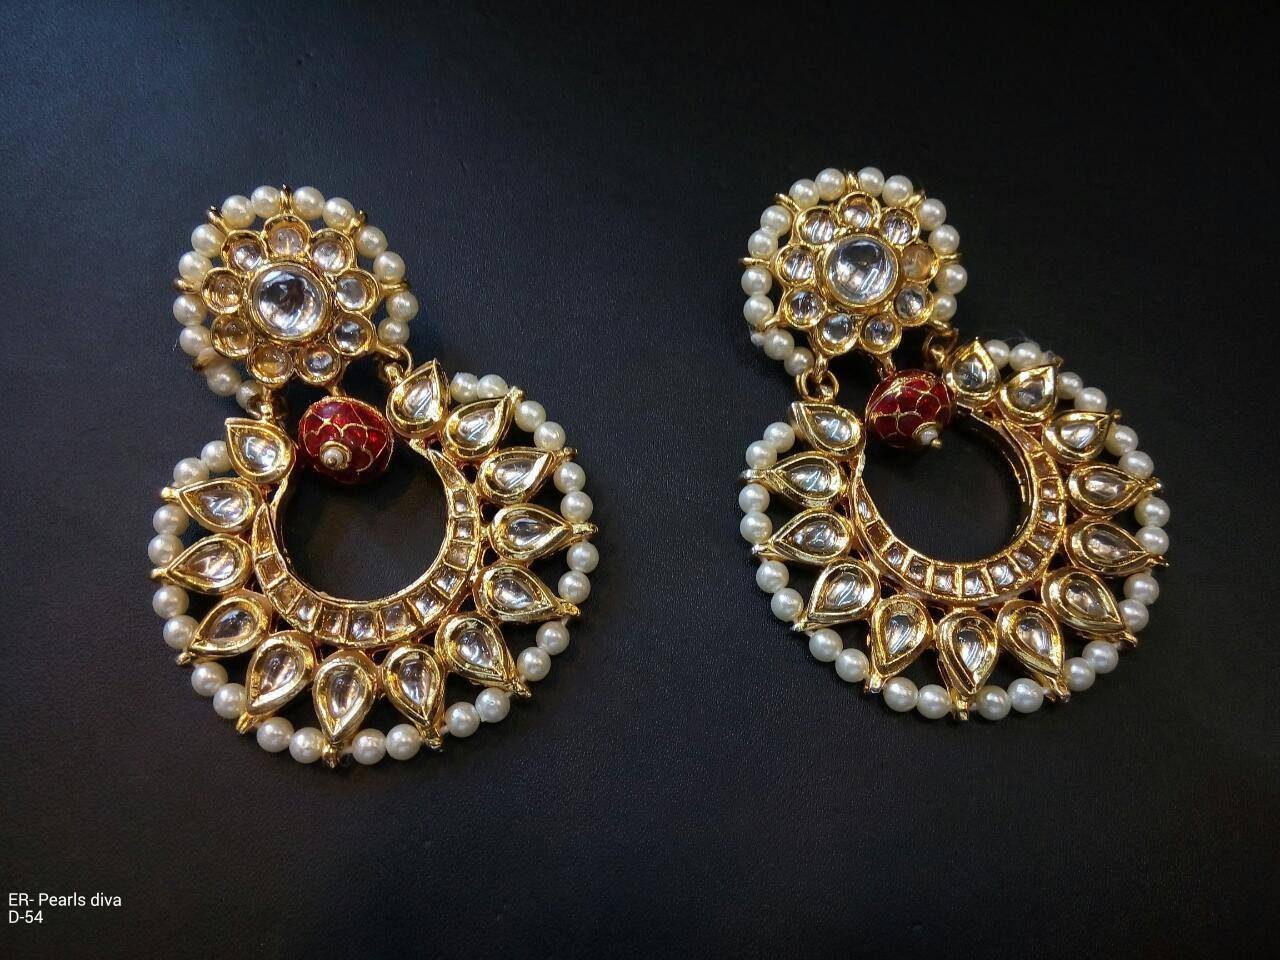 TIPTOP-Chandbali Bollywood Jewelry Gold Tone Blue Beads Kundan Earrings Jhumka Jhumki